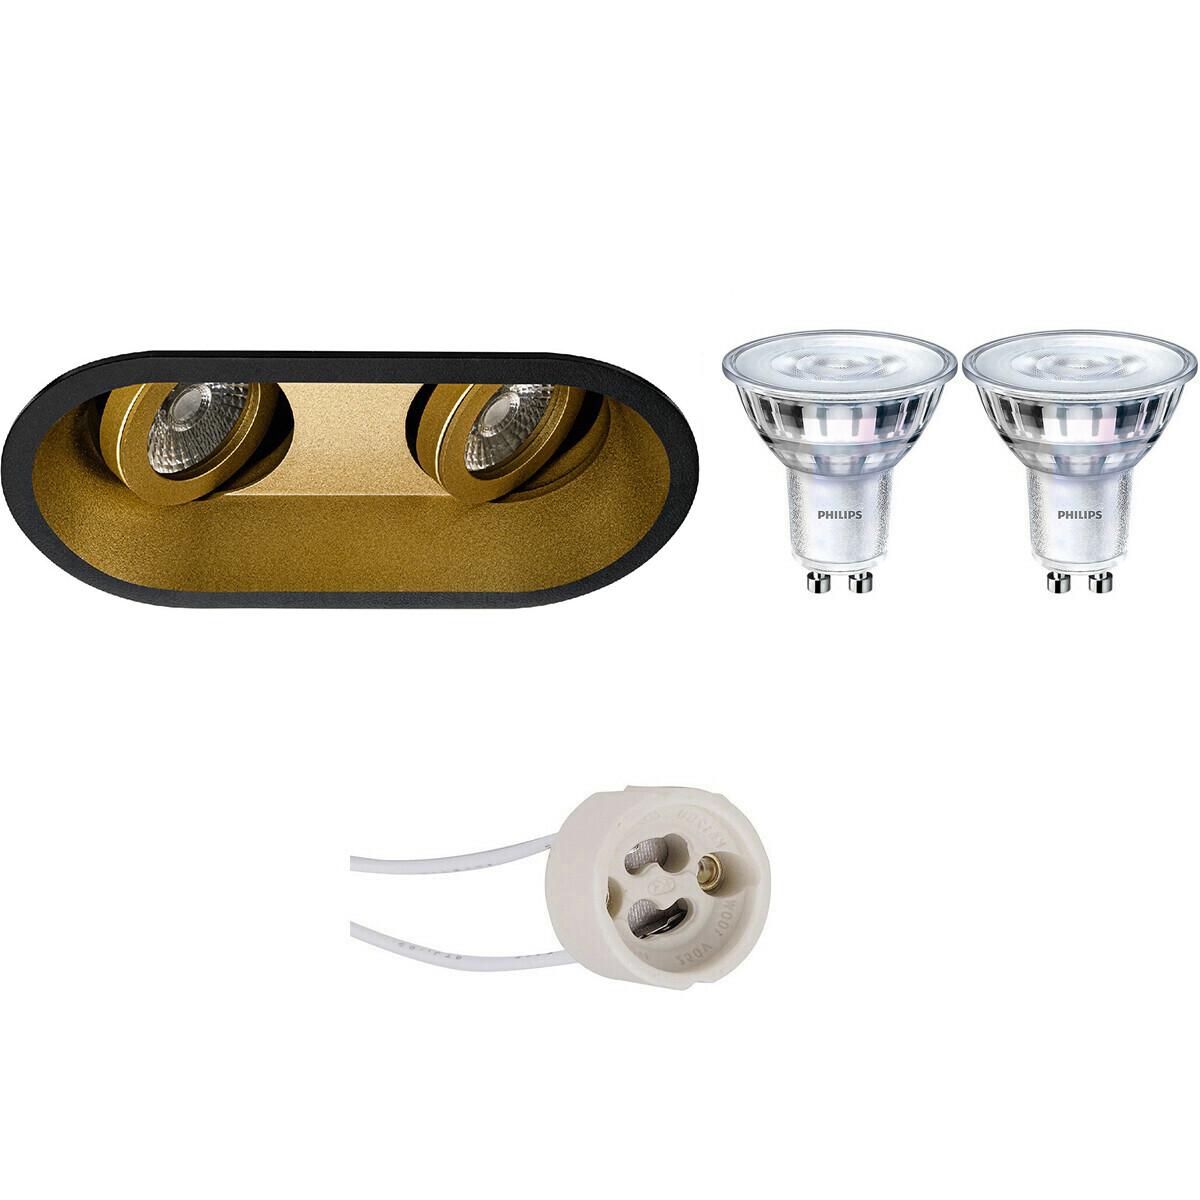 PHILIPS - LED Spot Set - SceneSwitch 827 36D - Pragmi Zano Pro - GU10 Fitting - Dimbaar - Inbouw Ova